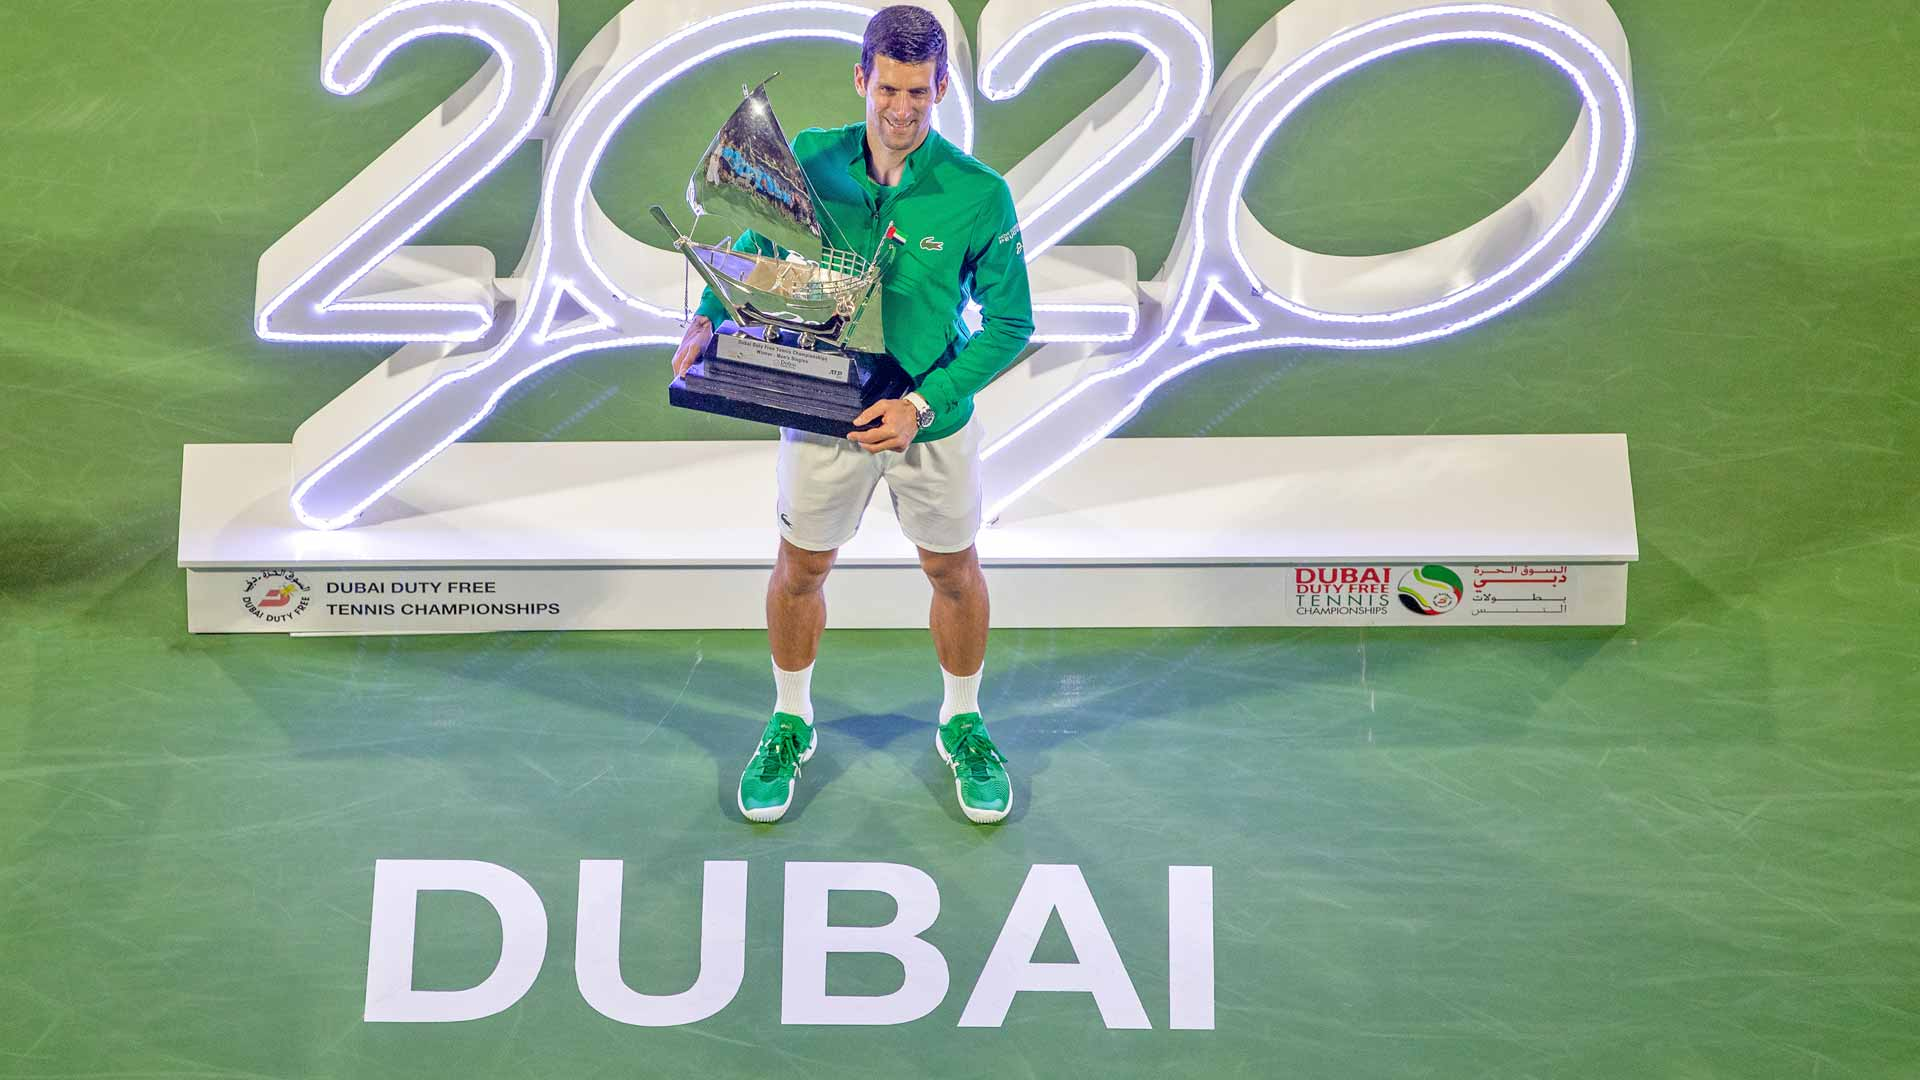 Novak Djokovic - 7 - Page 2 Djokovic-dubai-2020-trophy-celebration